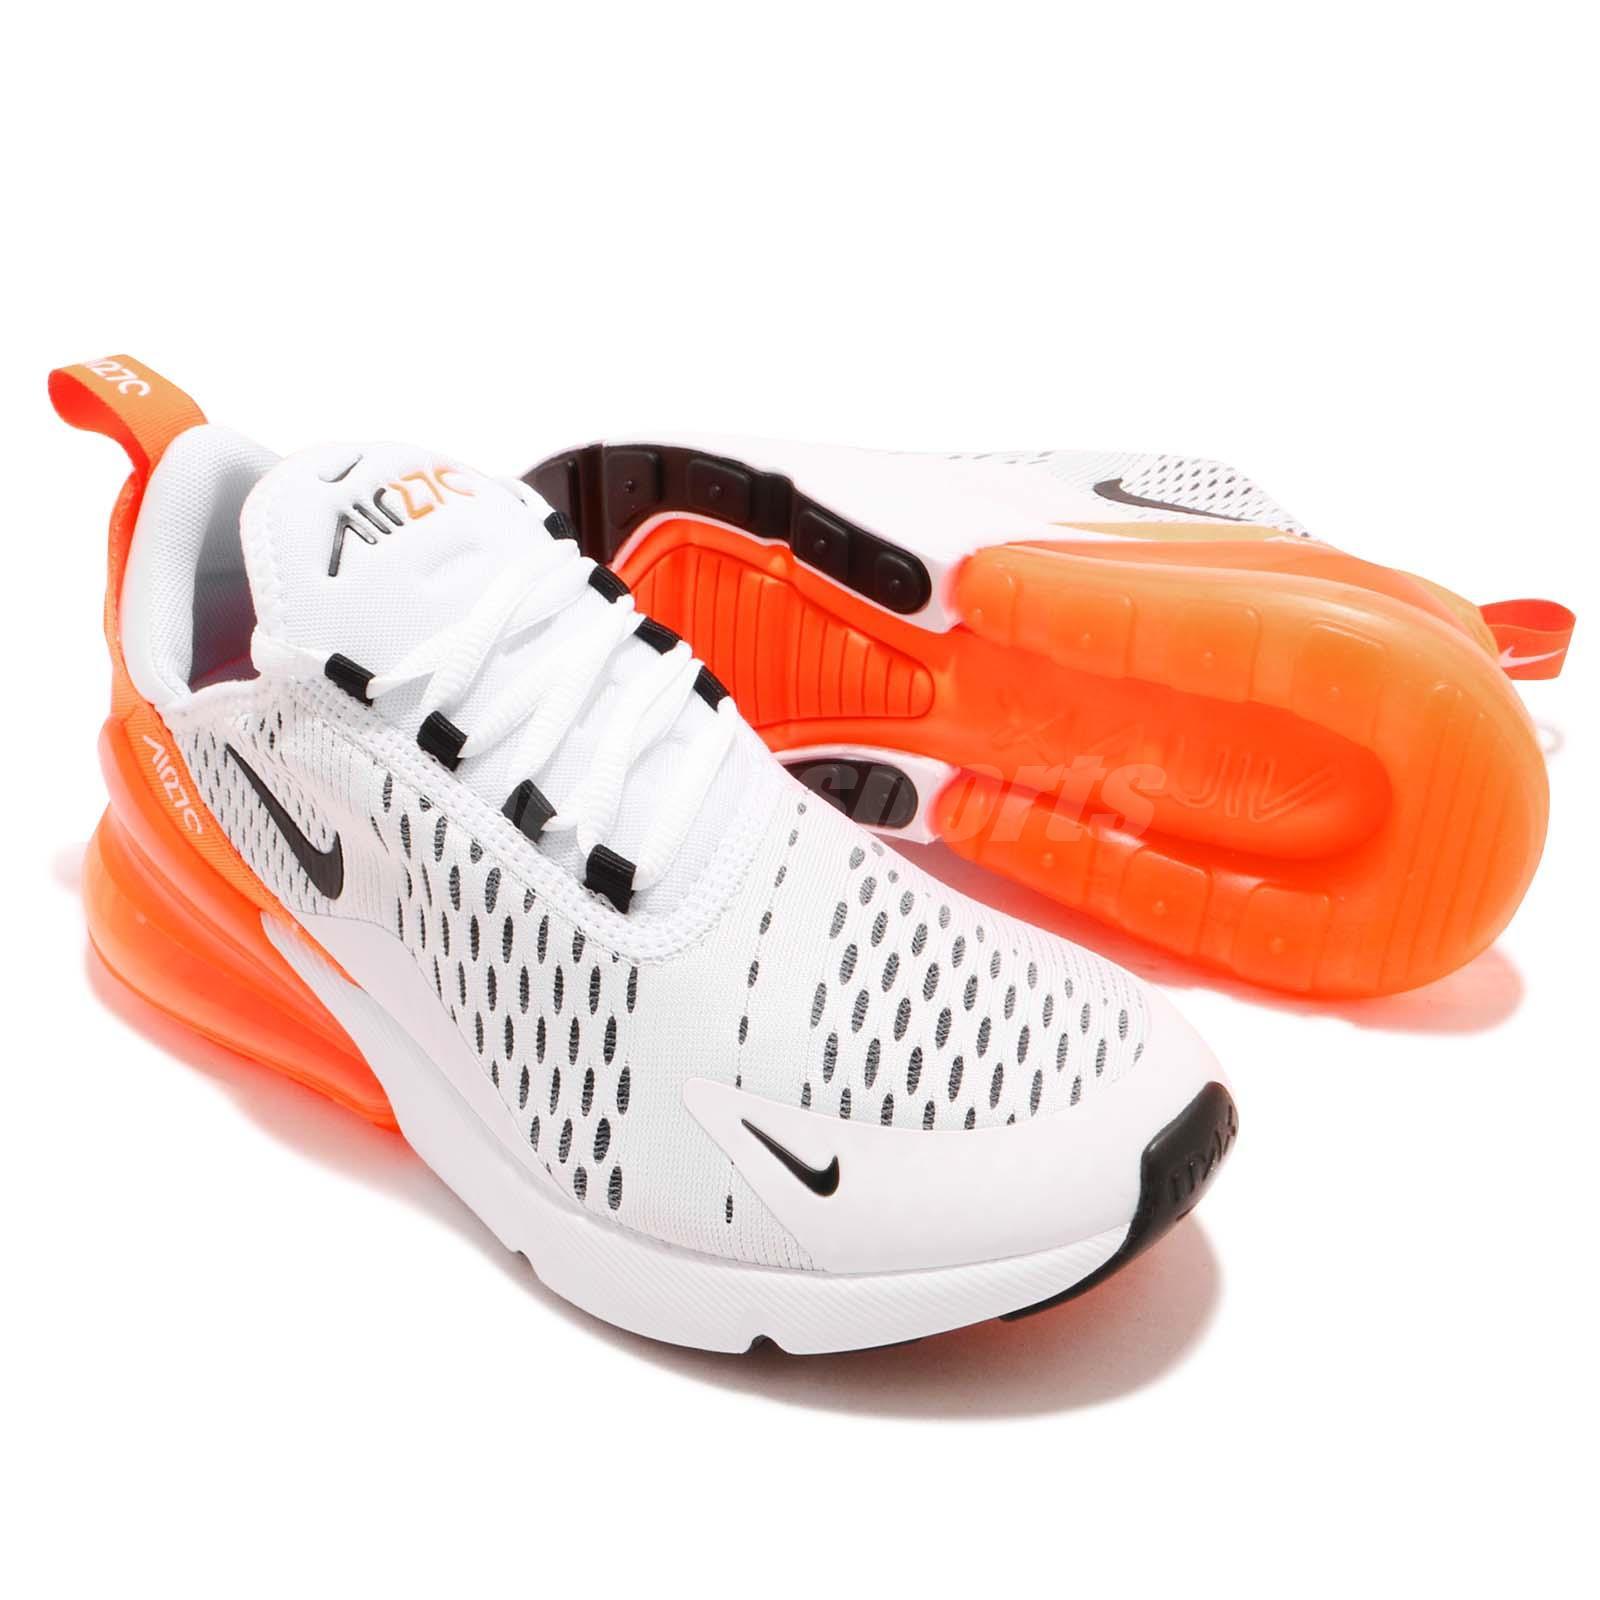 Nike Wmns Air Max 270 White Black Orange Women Running Shoes ... c2f1950a66d